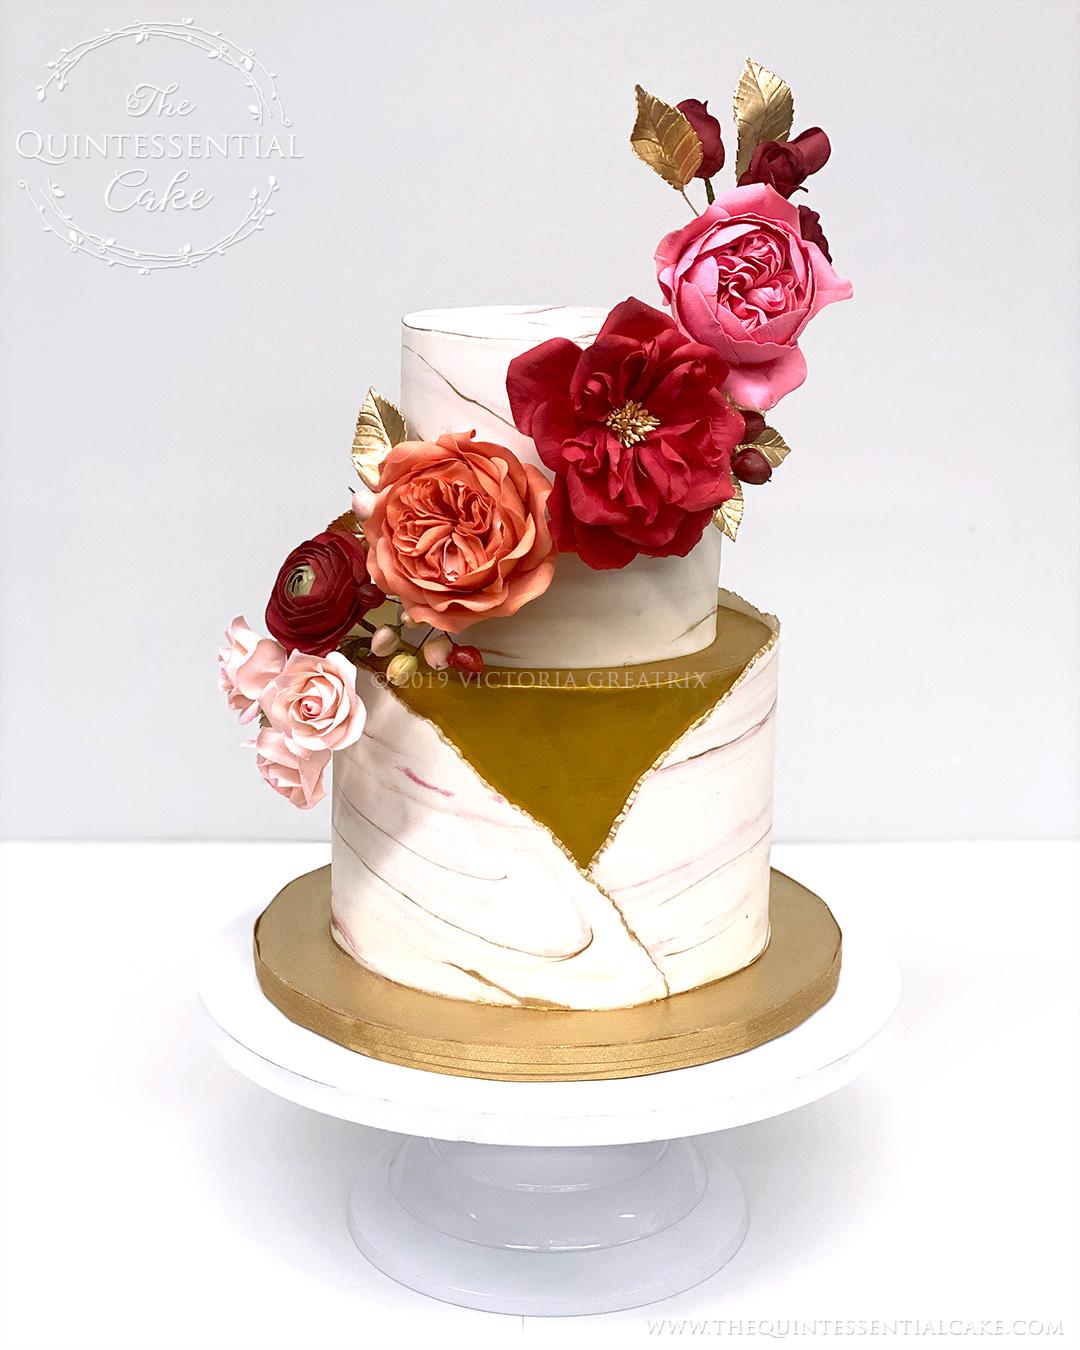 TQC Small Wedding Cake with Sugar Flowers | The Quintessential Cake | Wheaton | Chicago | Wedding Cakes